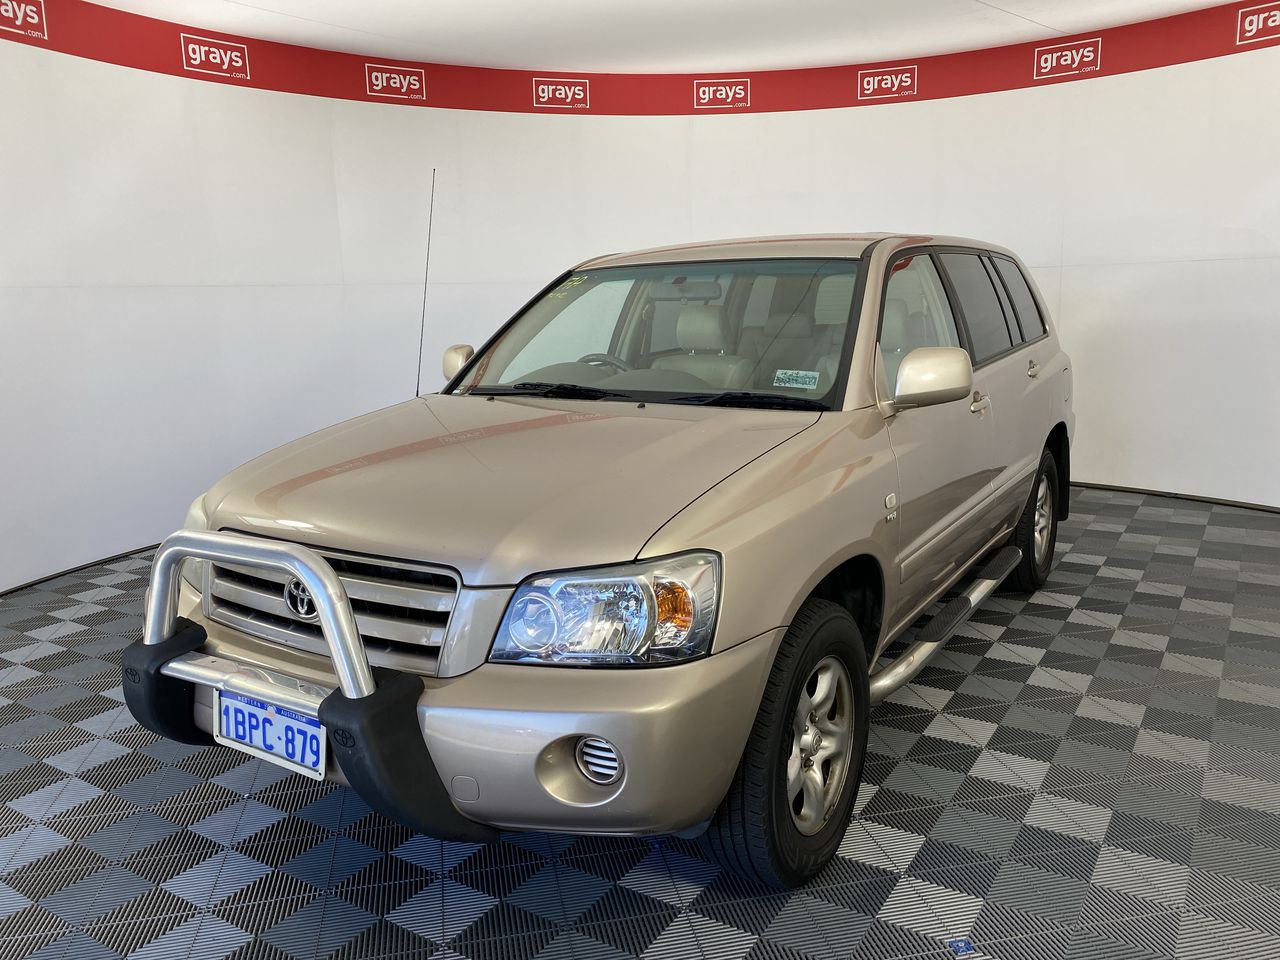 2003 Toyota Kluger CVX (AWD) Automatic 7 Seats Wagon